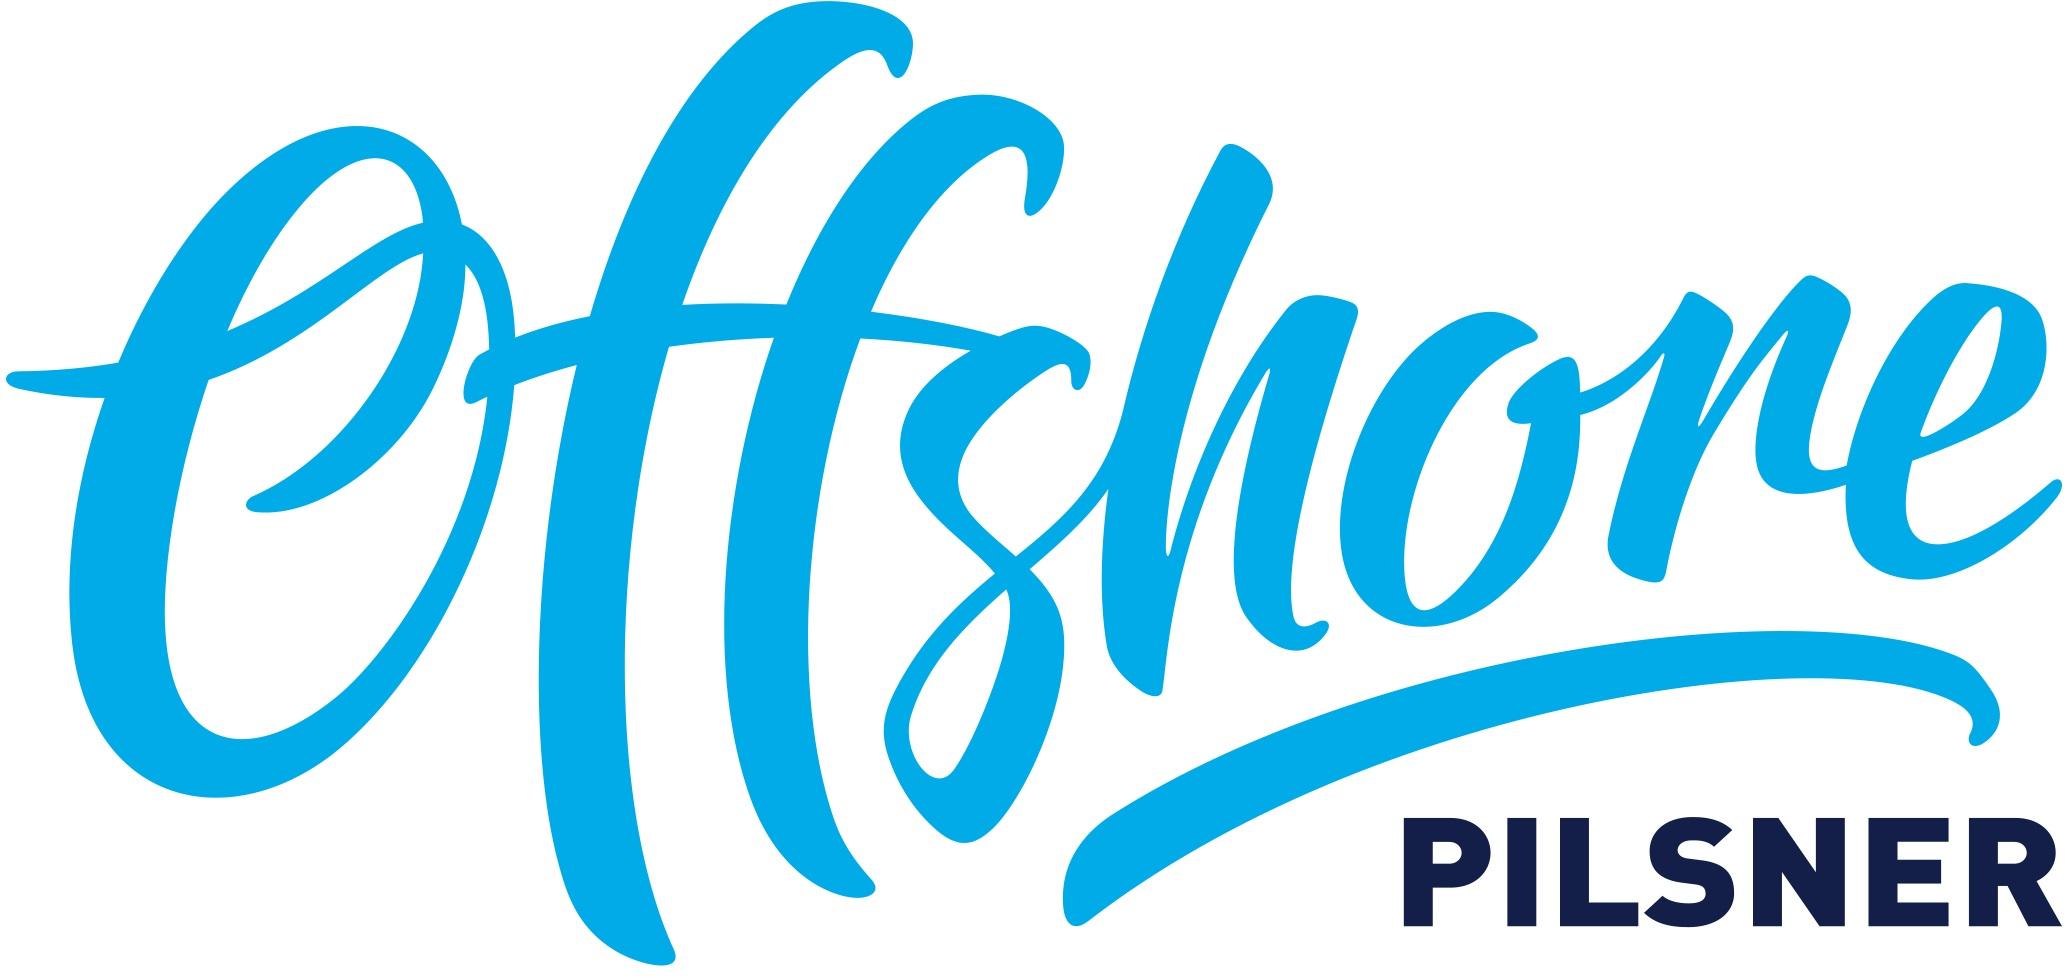 Offshore+and+Sharp%27s+logos.jpg